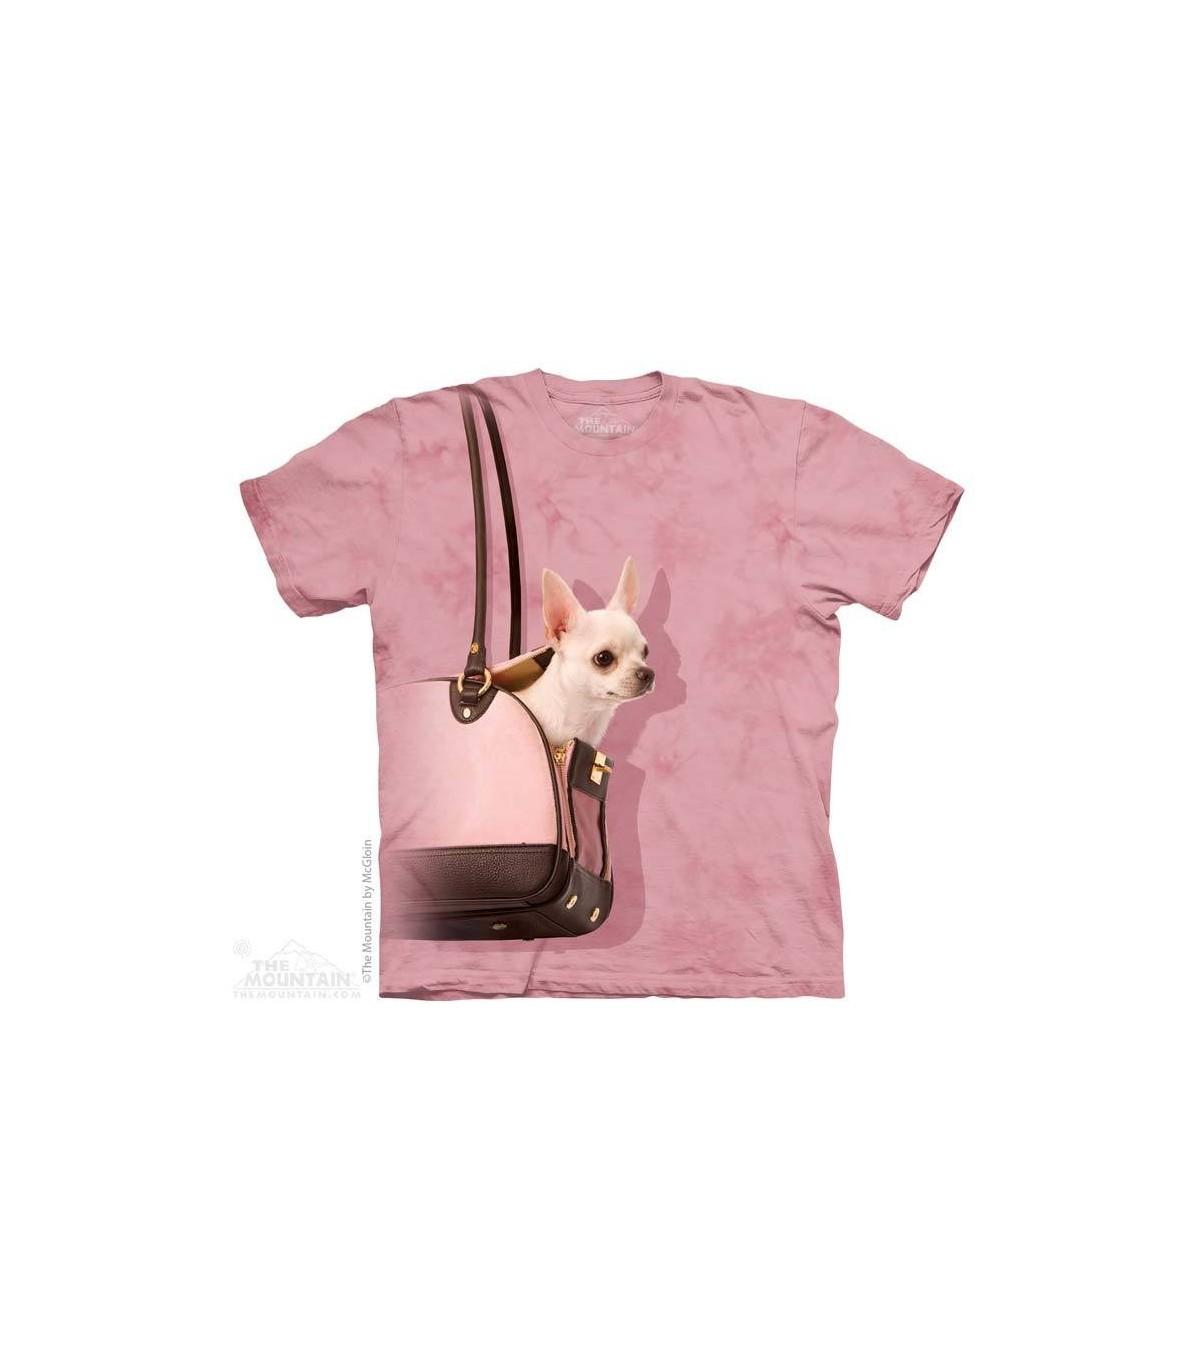 96ec3b1ca Handbag Chihuahua - Dog T Shirt The Mountain